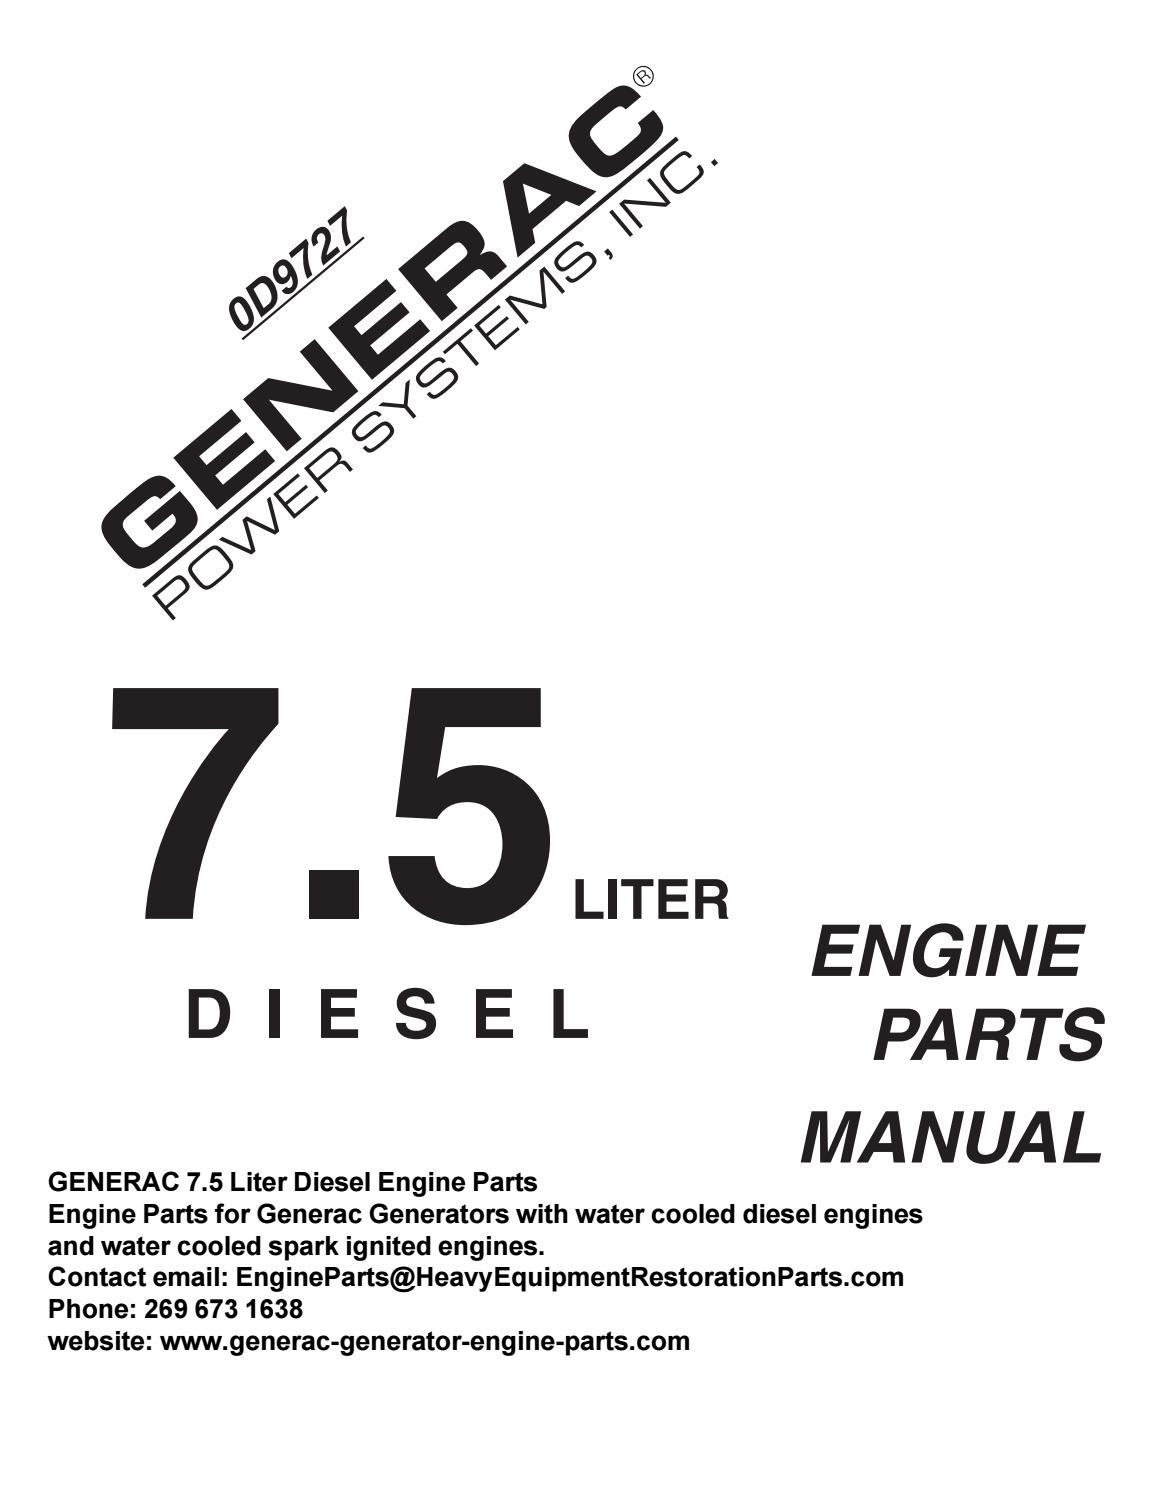 GENERAC 0D5703 Mitsubishi Diesel Engine Parts Manual 7.5